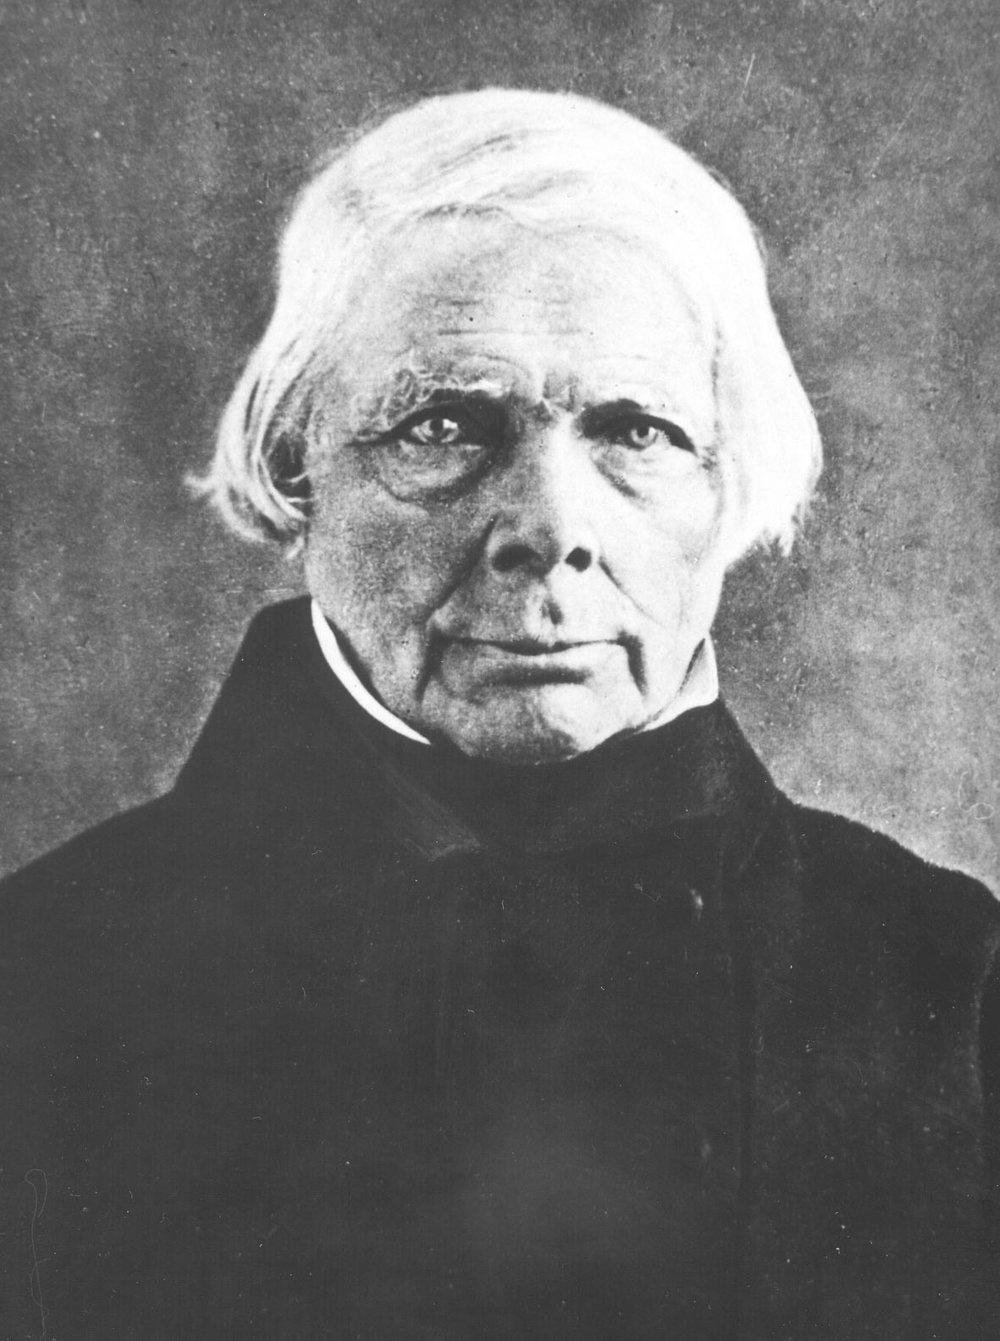 Daguerrotipo de Friedrich Schelling (1775-1854)